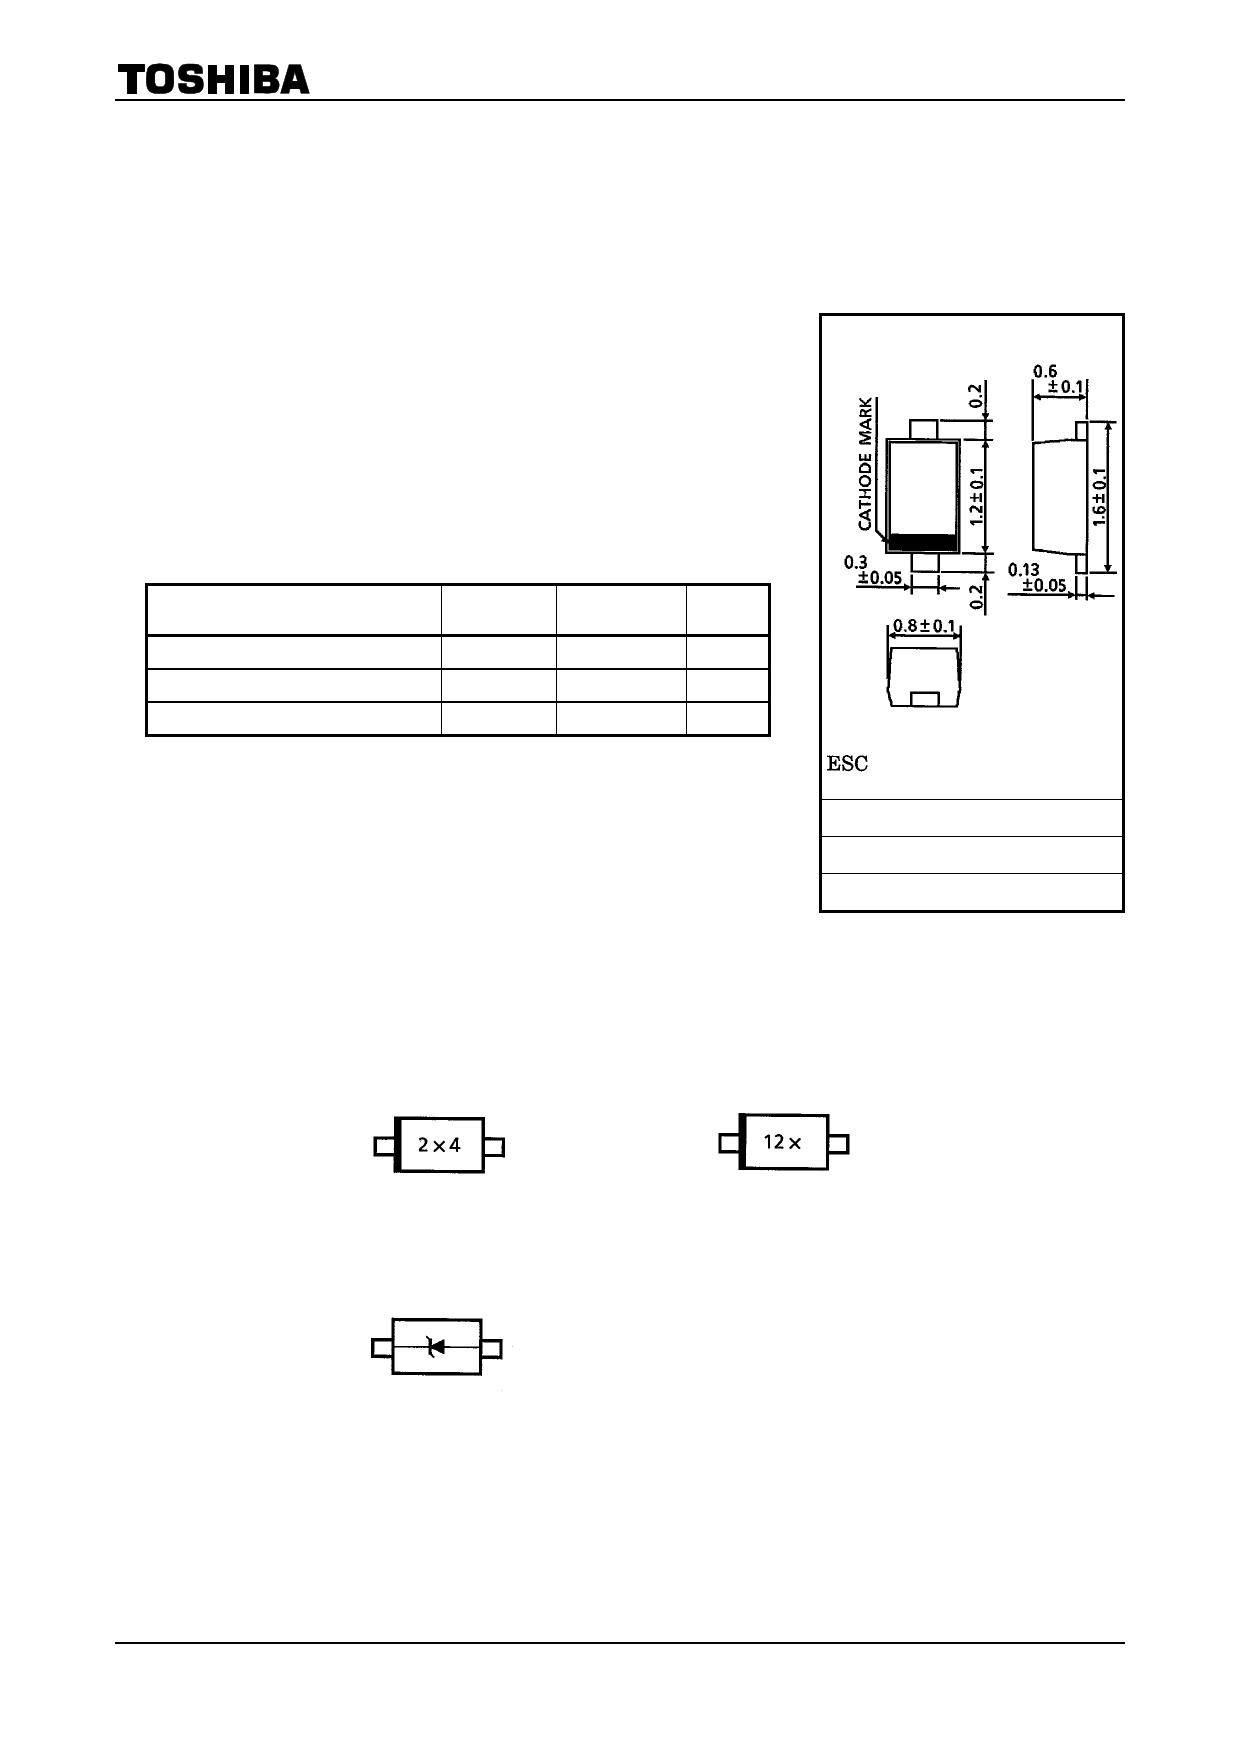 015AZ6.2 datasheet